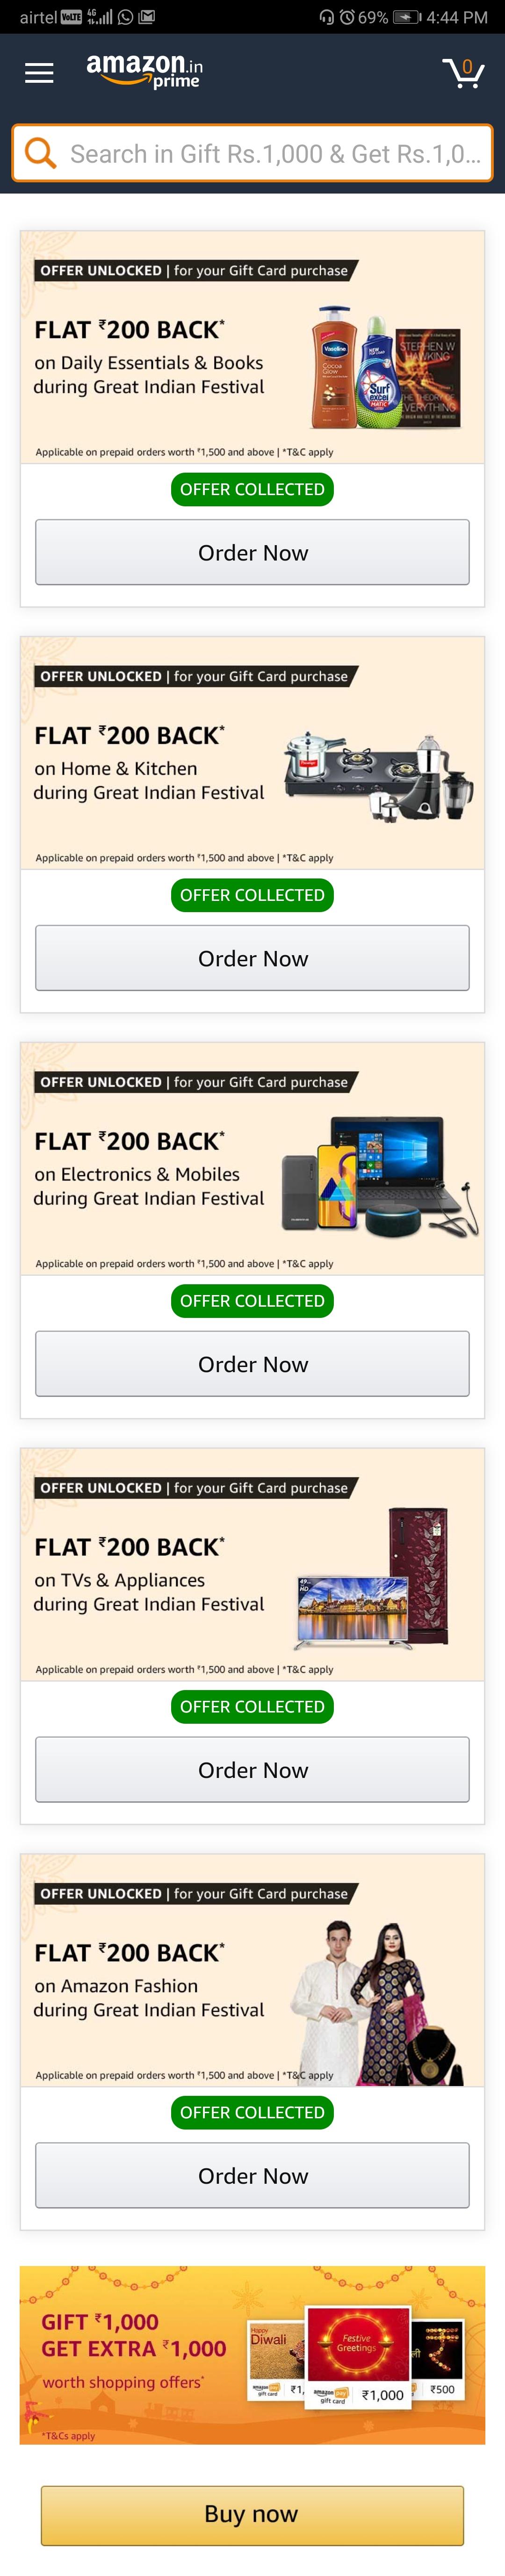 https://cdn0.desidime.com/attachments/photos/590866/original/Screenshot_20191015_164412_in.amazon.mShop.android.shopping.jpg?1571138511